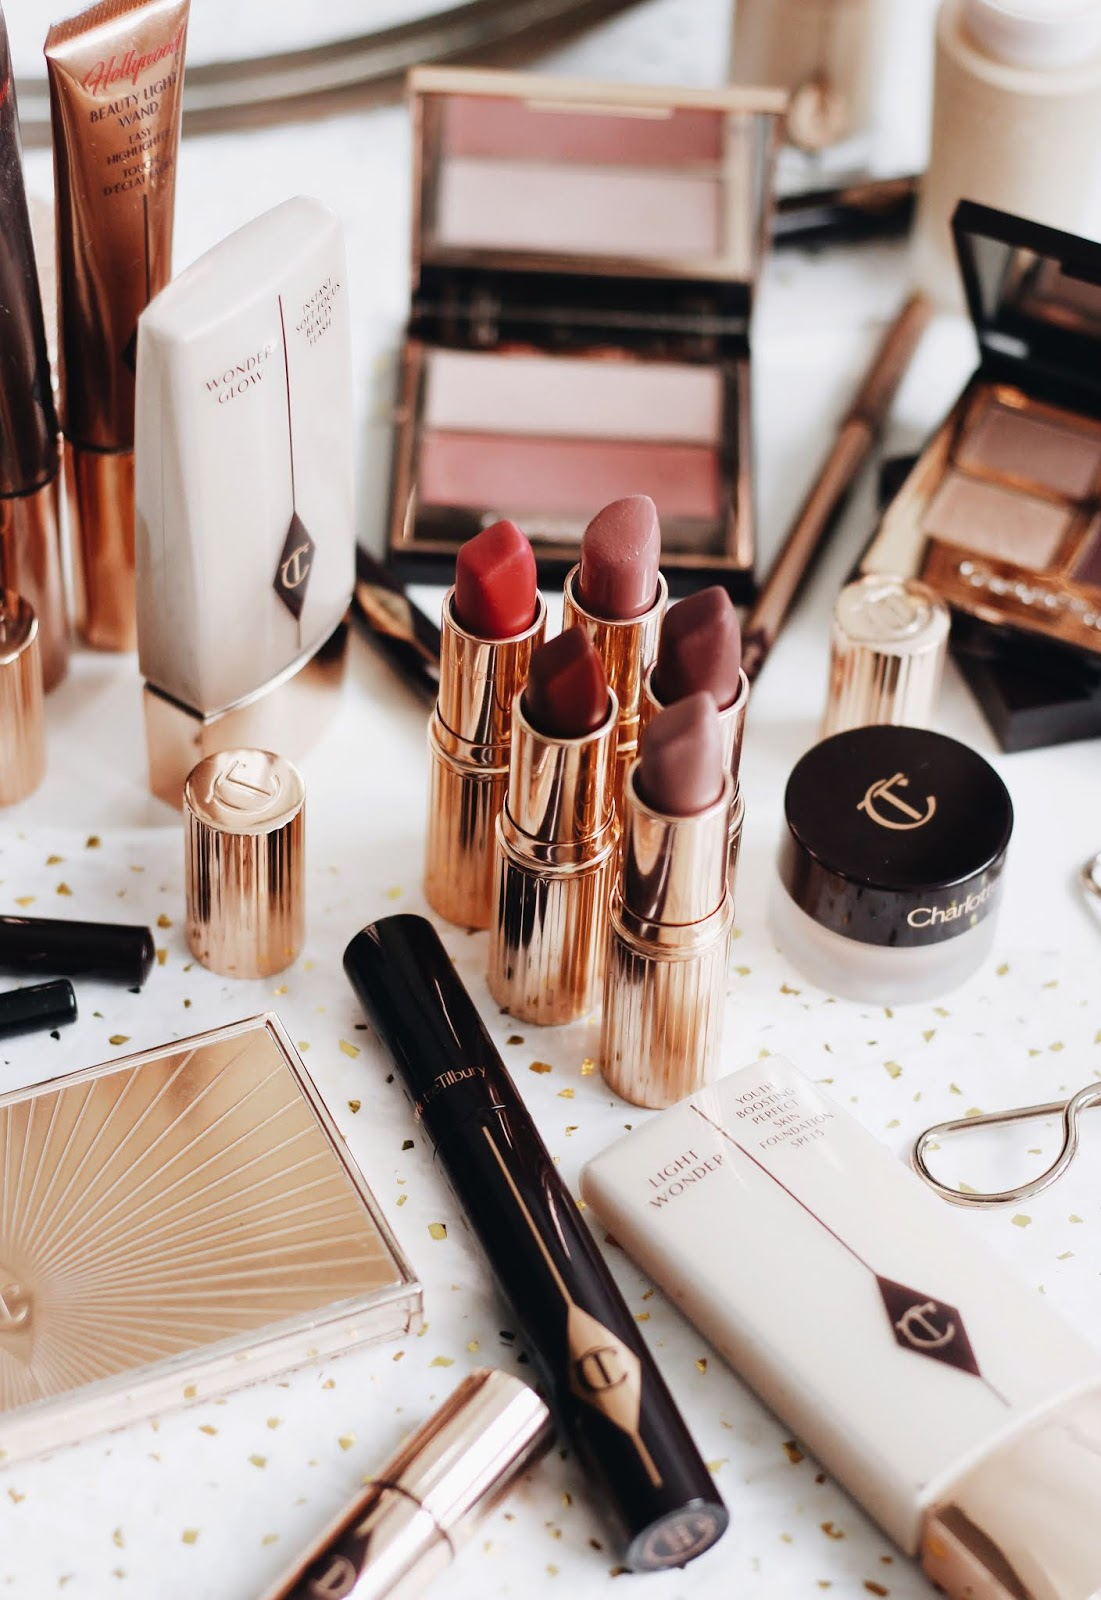 Favourite Charlotte Tilbury Lipsticks Review